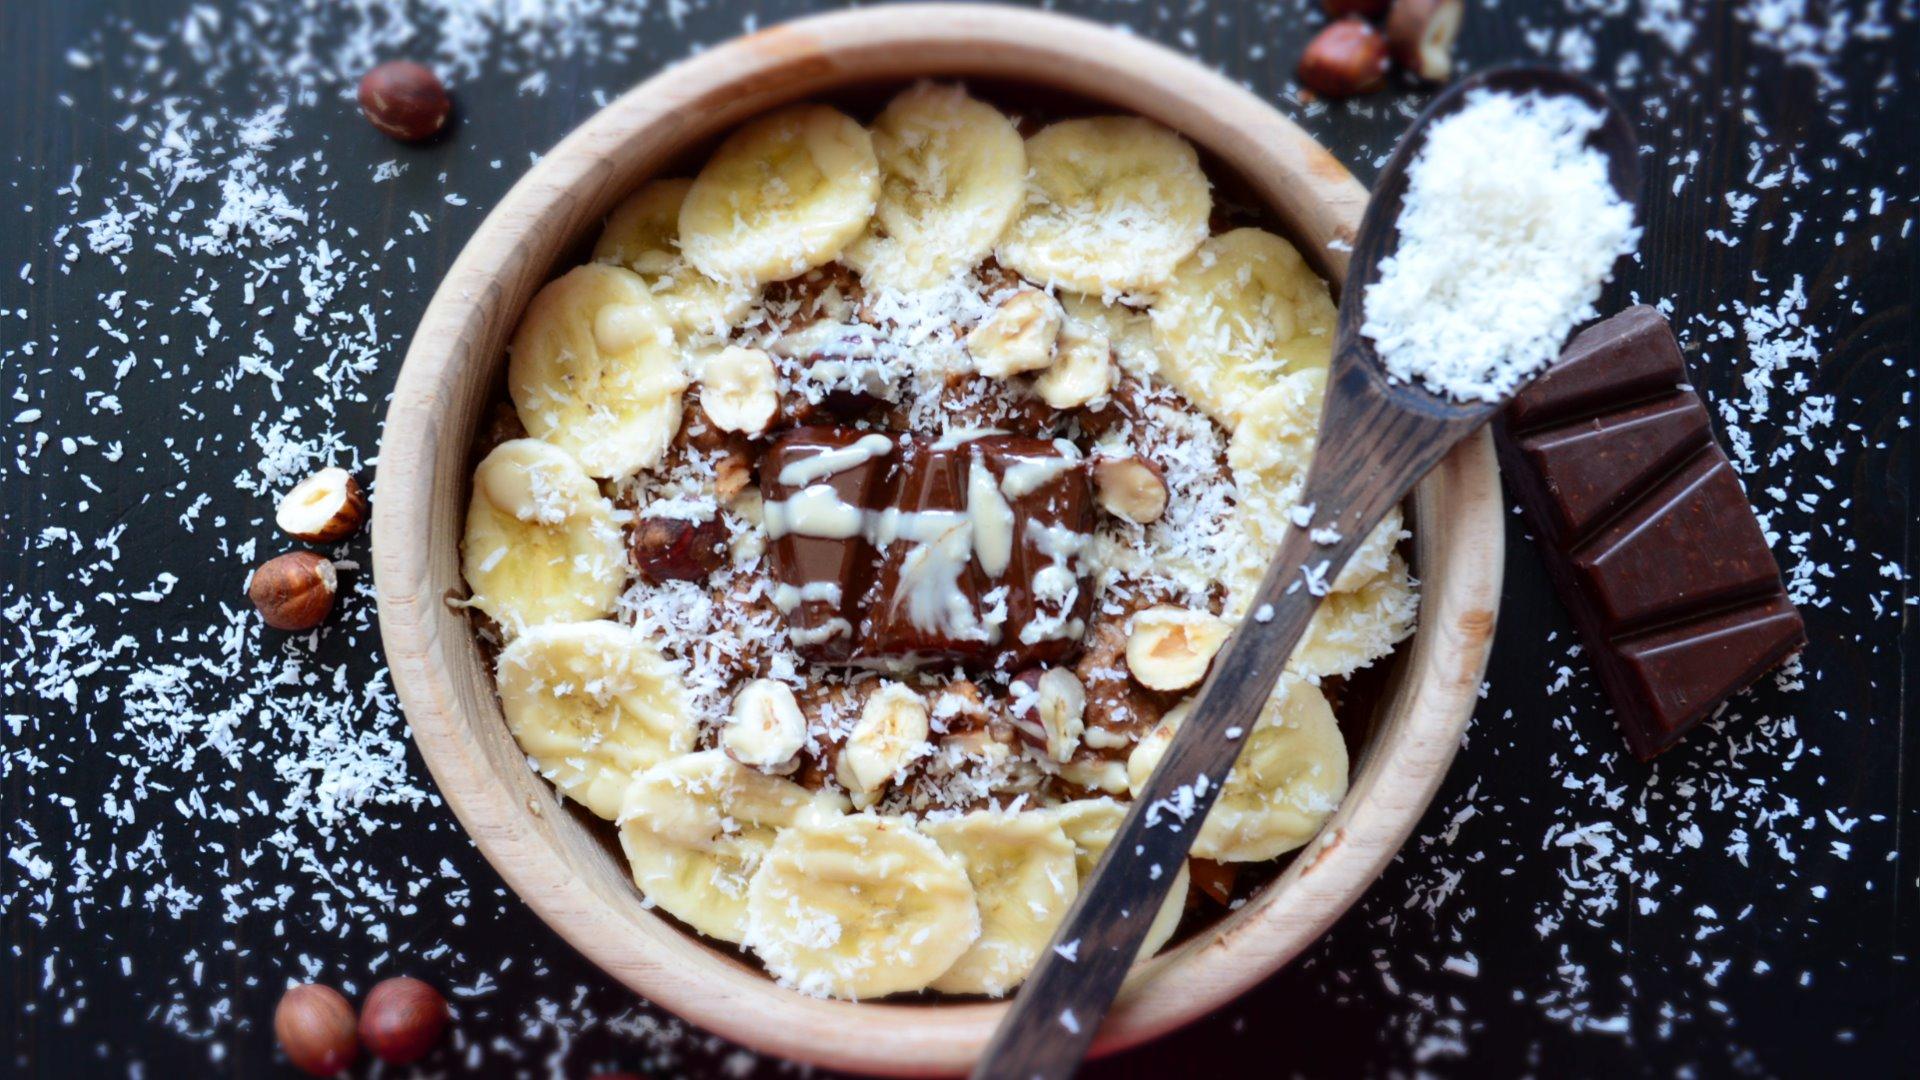 Bauerntüte Rezepte - Porridge